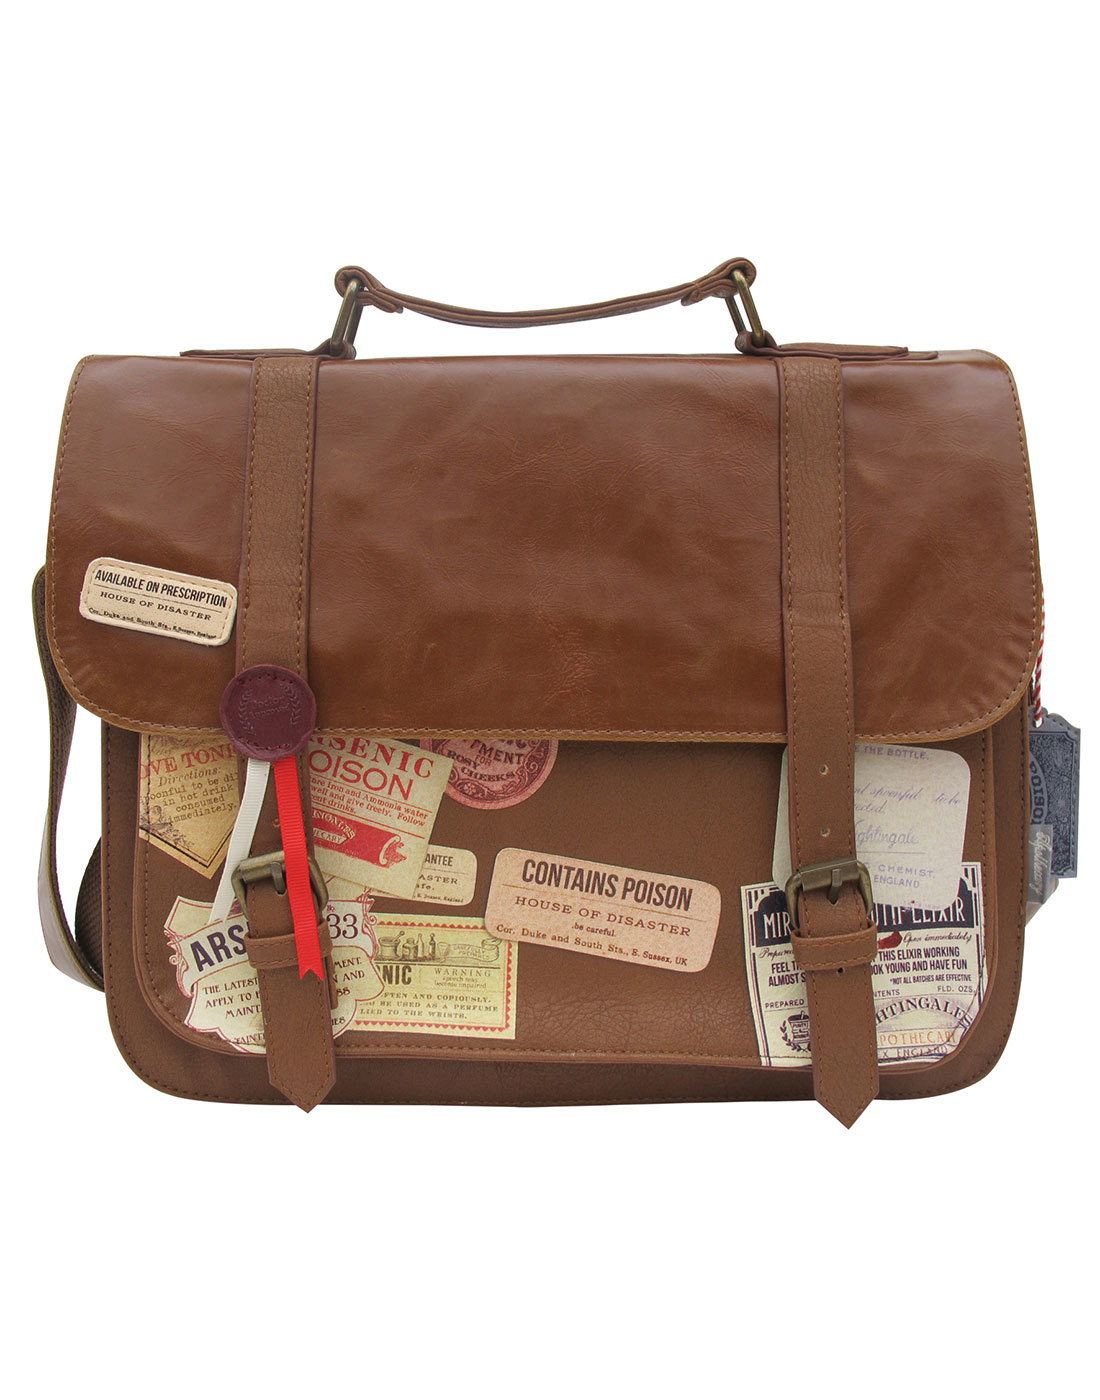 Apothecary Satchel DISASTER DESIGNS Shoulder Bag